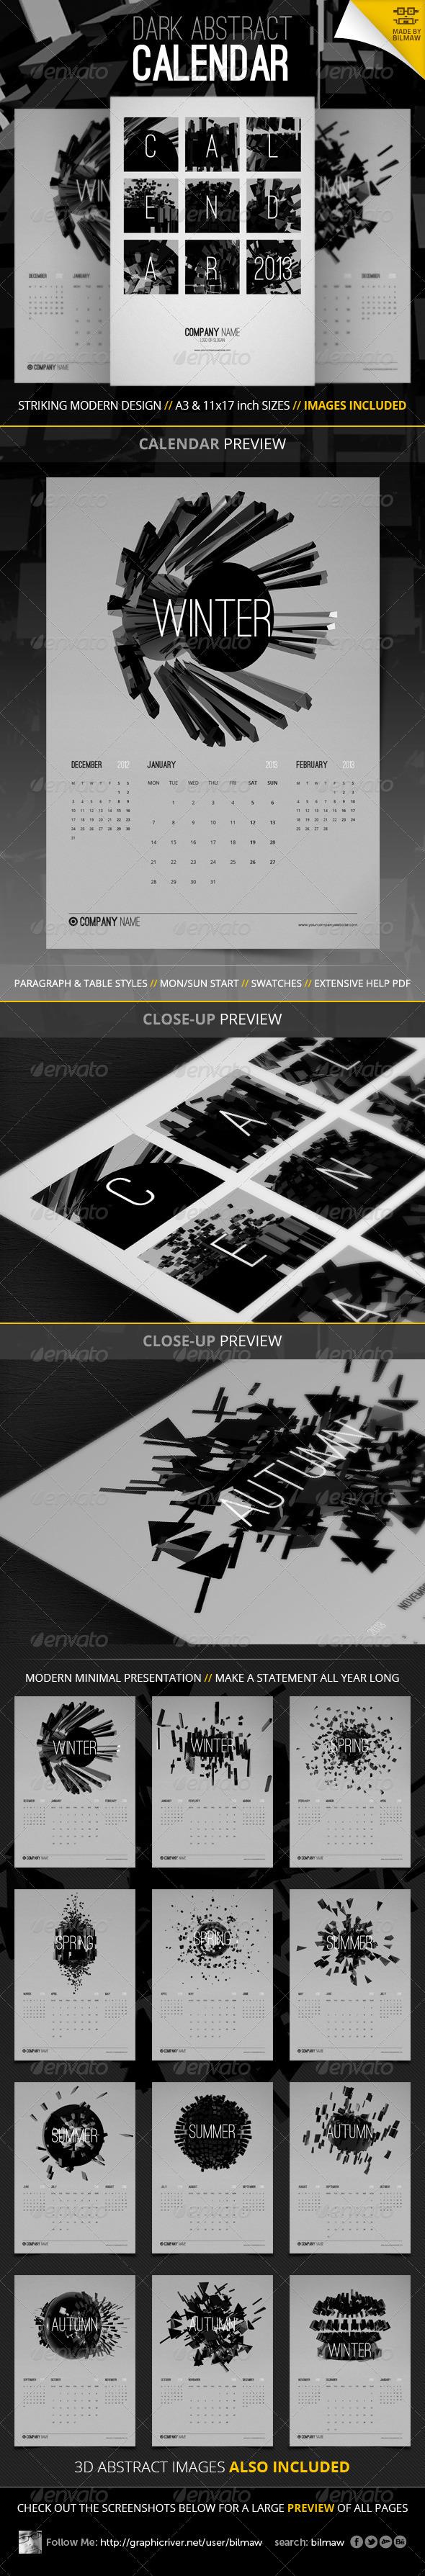 GraphicRiver Dark Abstract Calendar 3337344